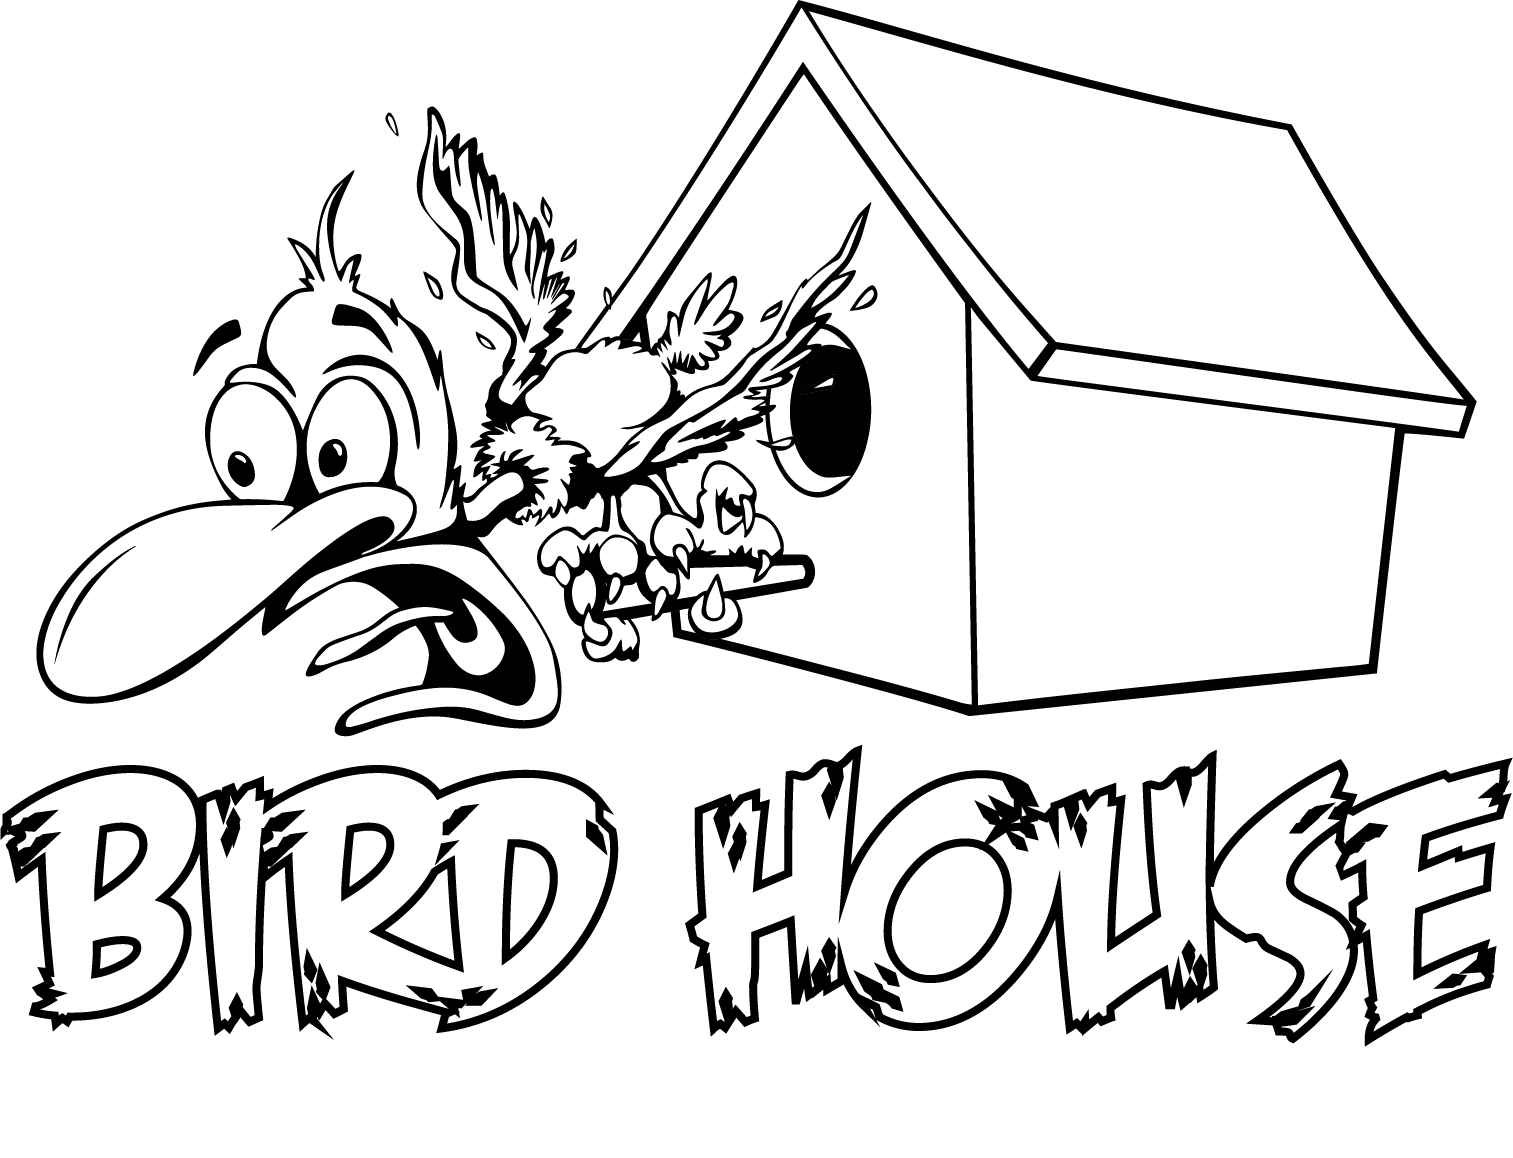 Bird House Print Shop